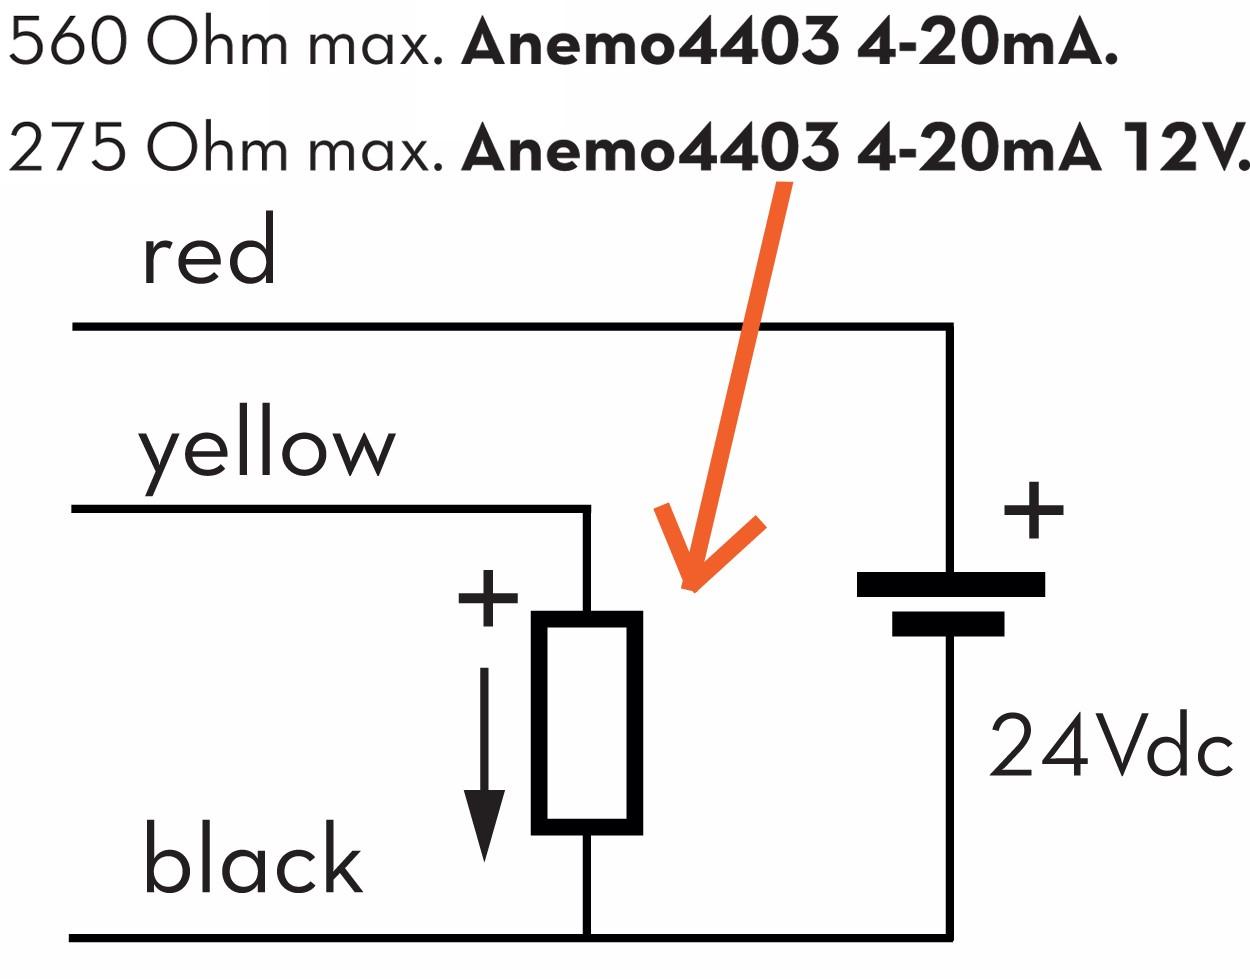 Anemo Rotating Anemometer Sensorogic Output